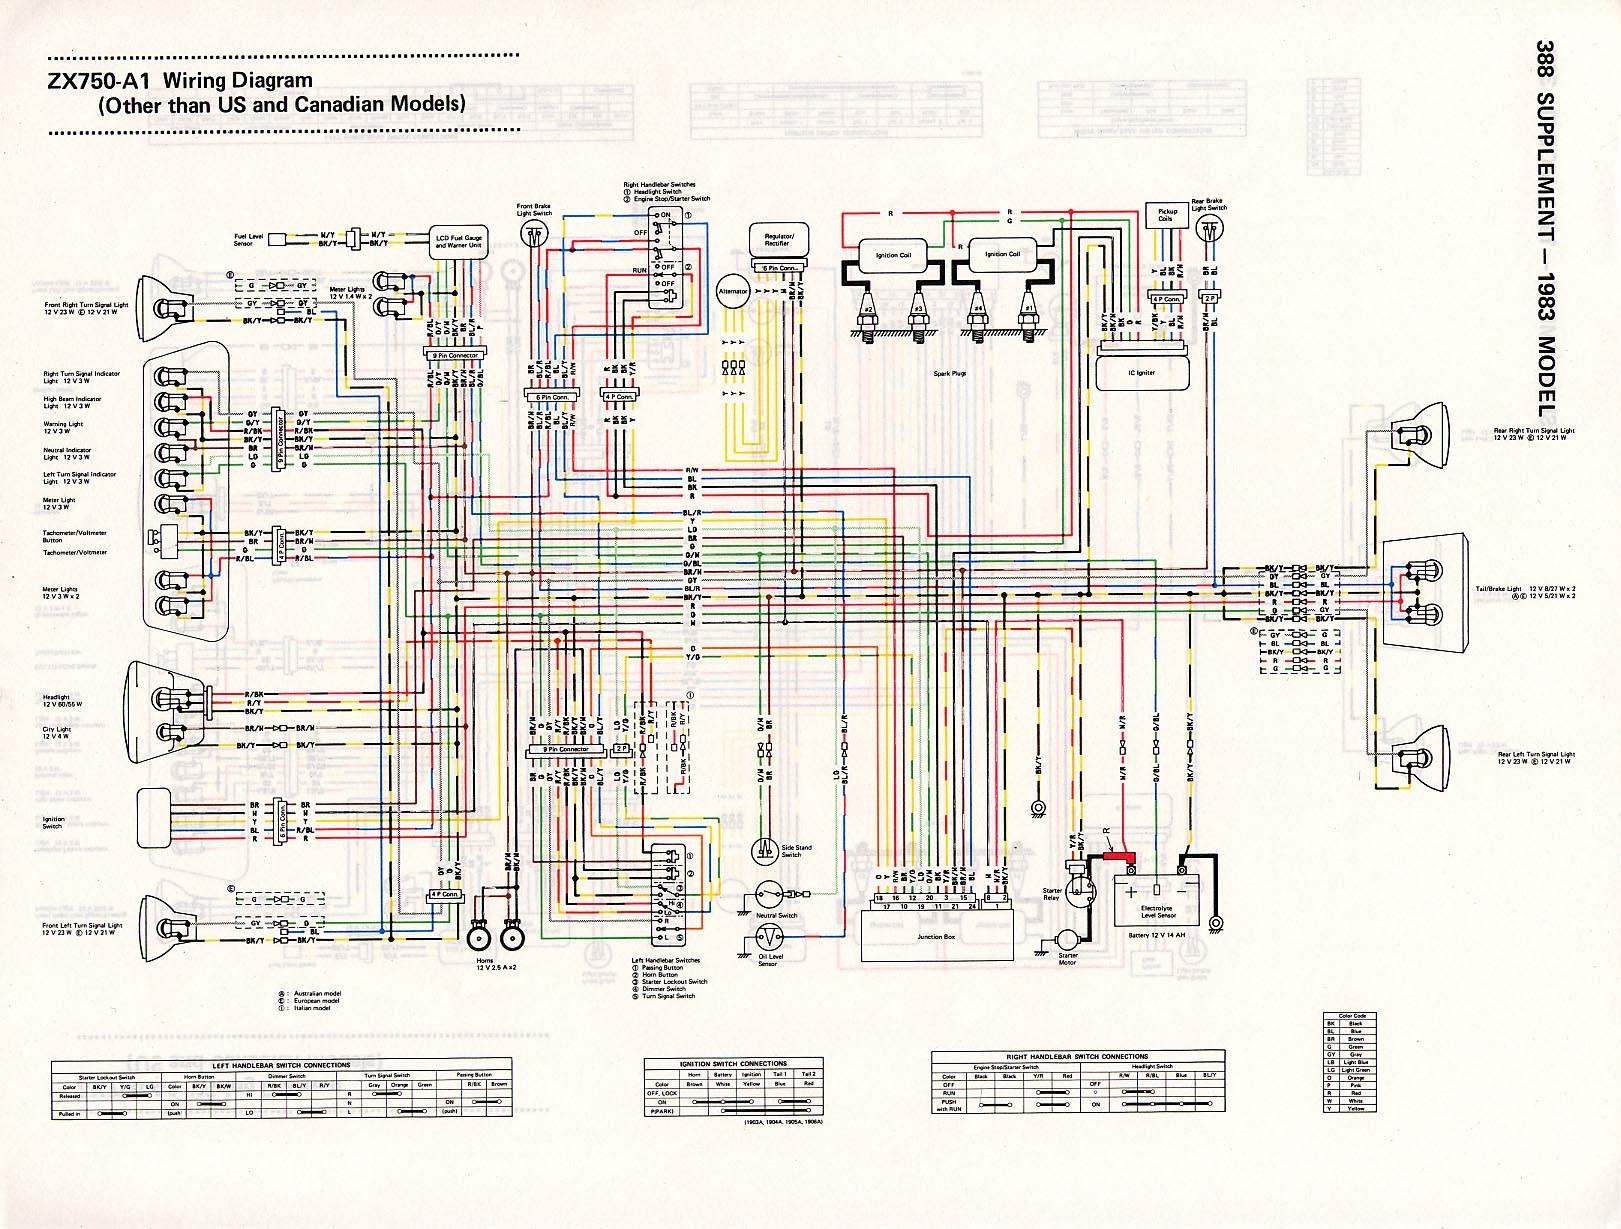 Terrific Kawasaki Gpz 1100 Wiring Diagram Wiring Diagram Document Guide Wiring Cloud Onicaxeromohammedshrineorg